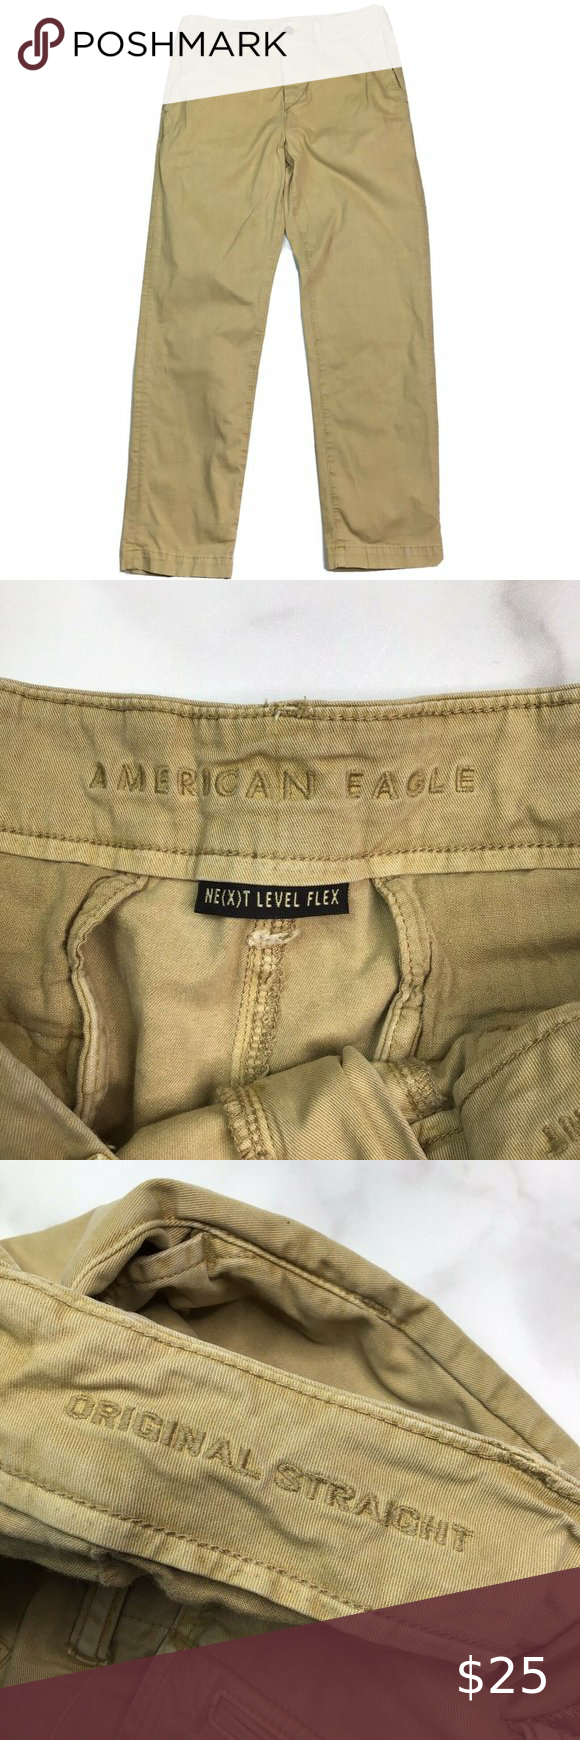 Men's Size 30x30 American Eagle Outfitters Straight Flex Khaki Pants